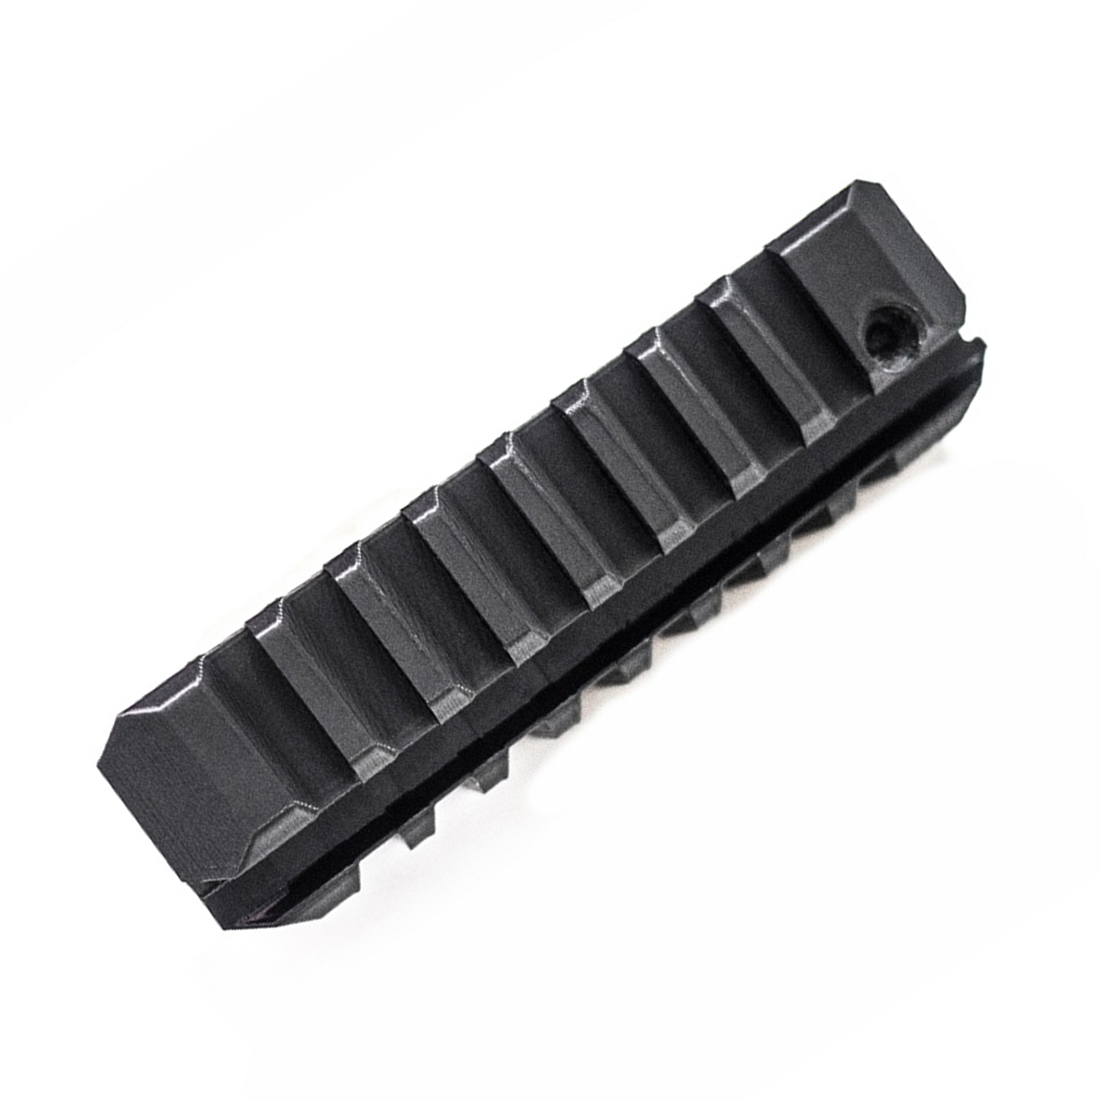 DK Front Rail For LH AUG Water Gel Beads Blaster - Black